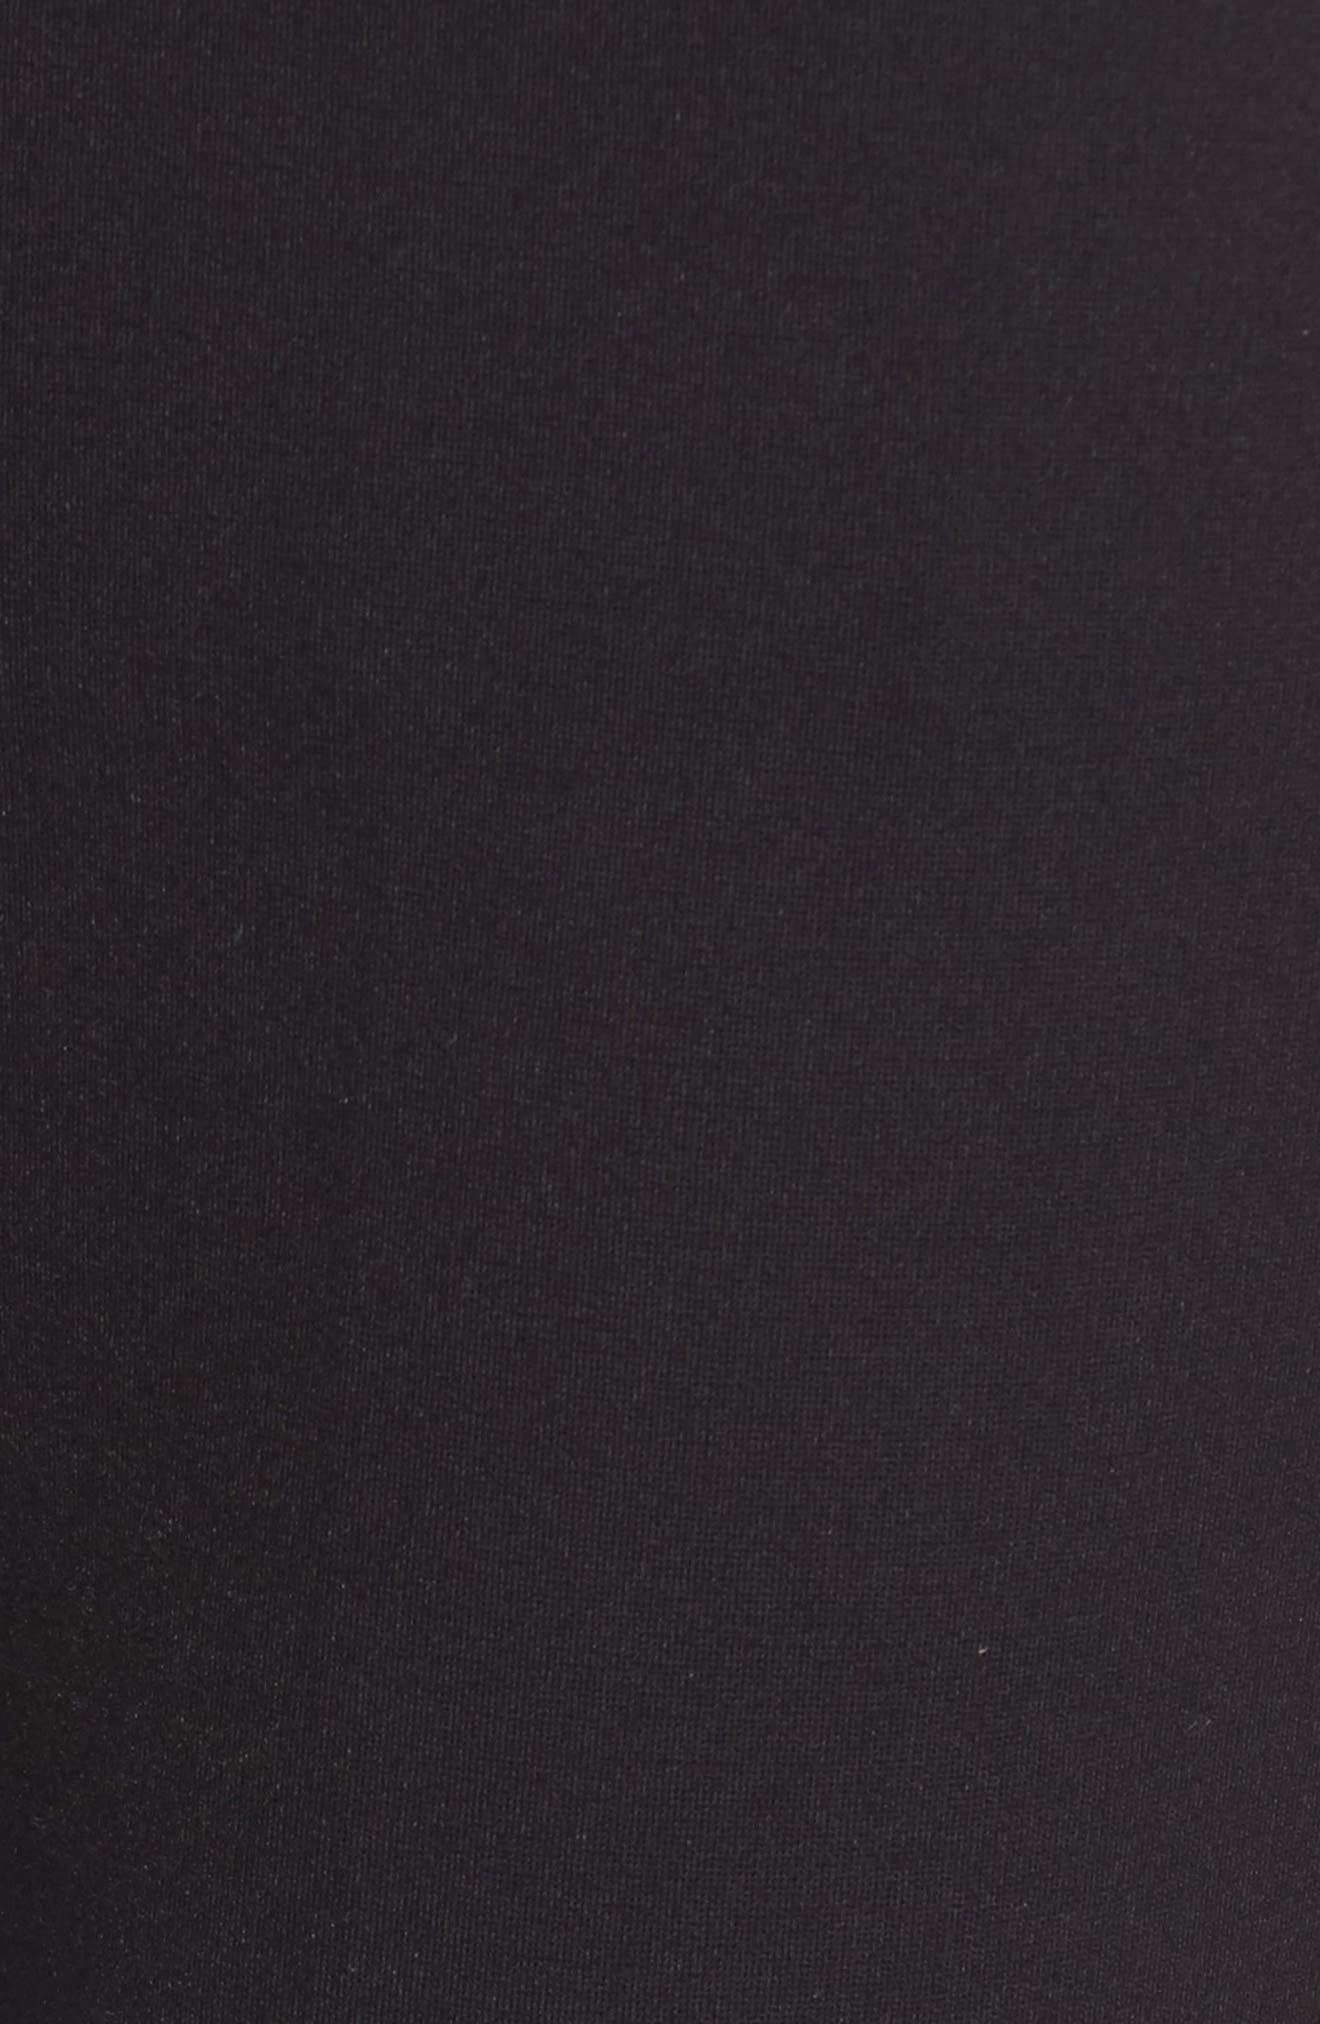 NYDJ, Stretch Knit Trousers, Alternate thumbnail 6, color, BLACK